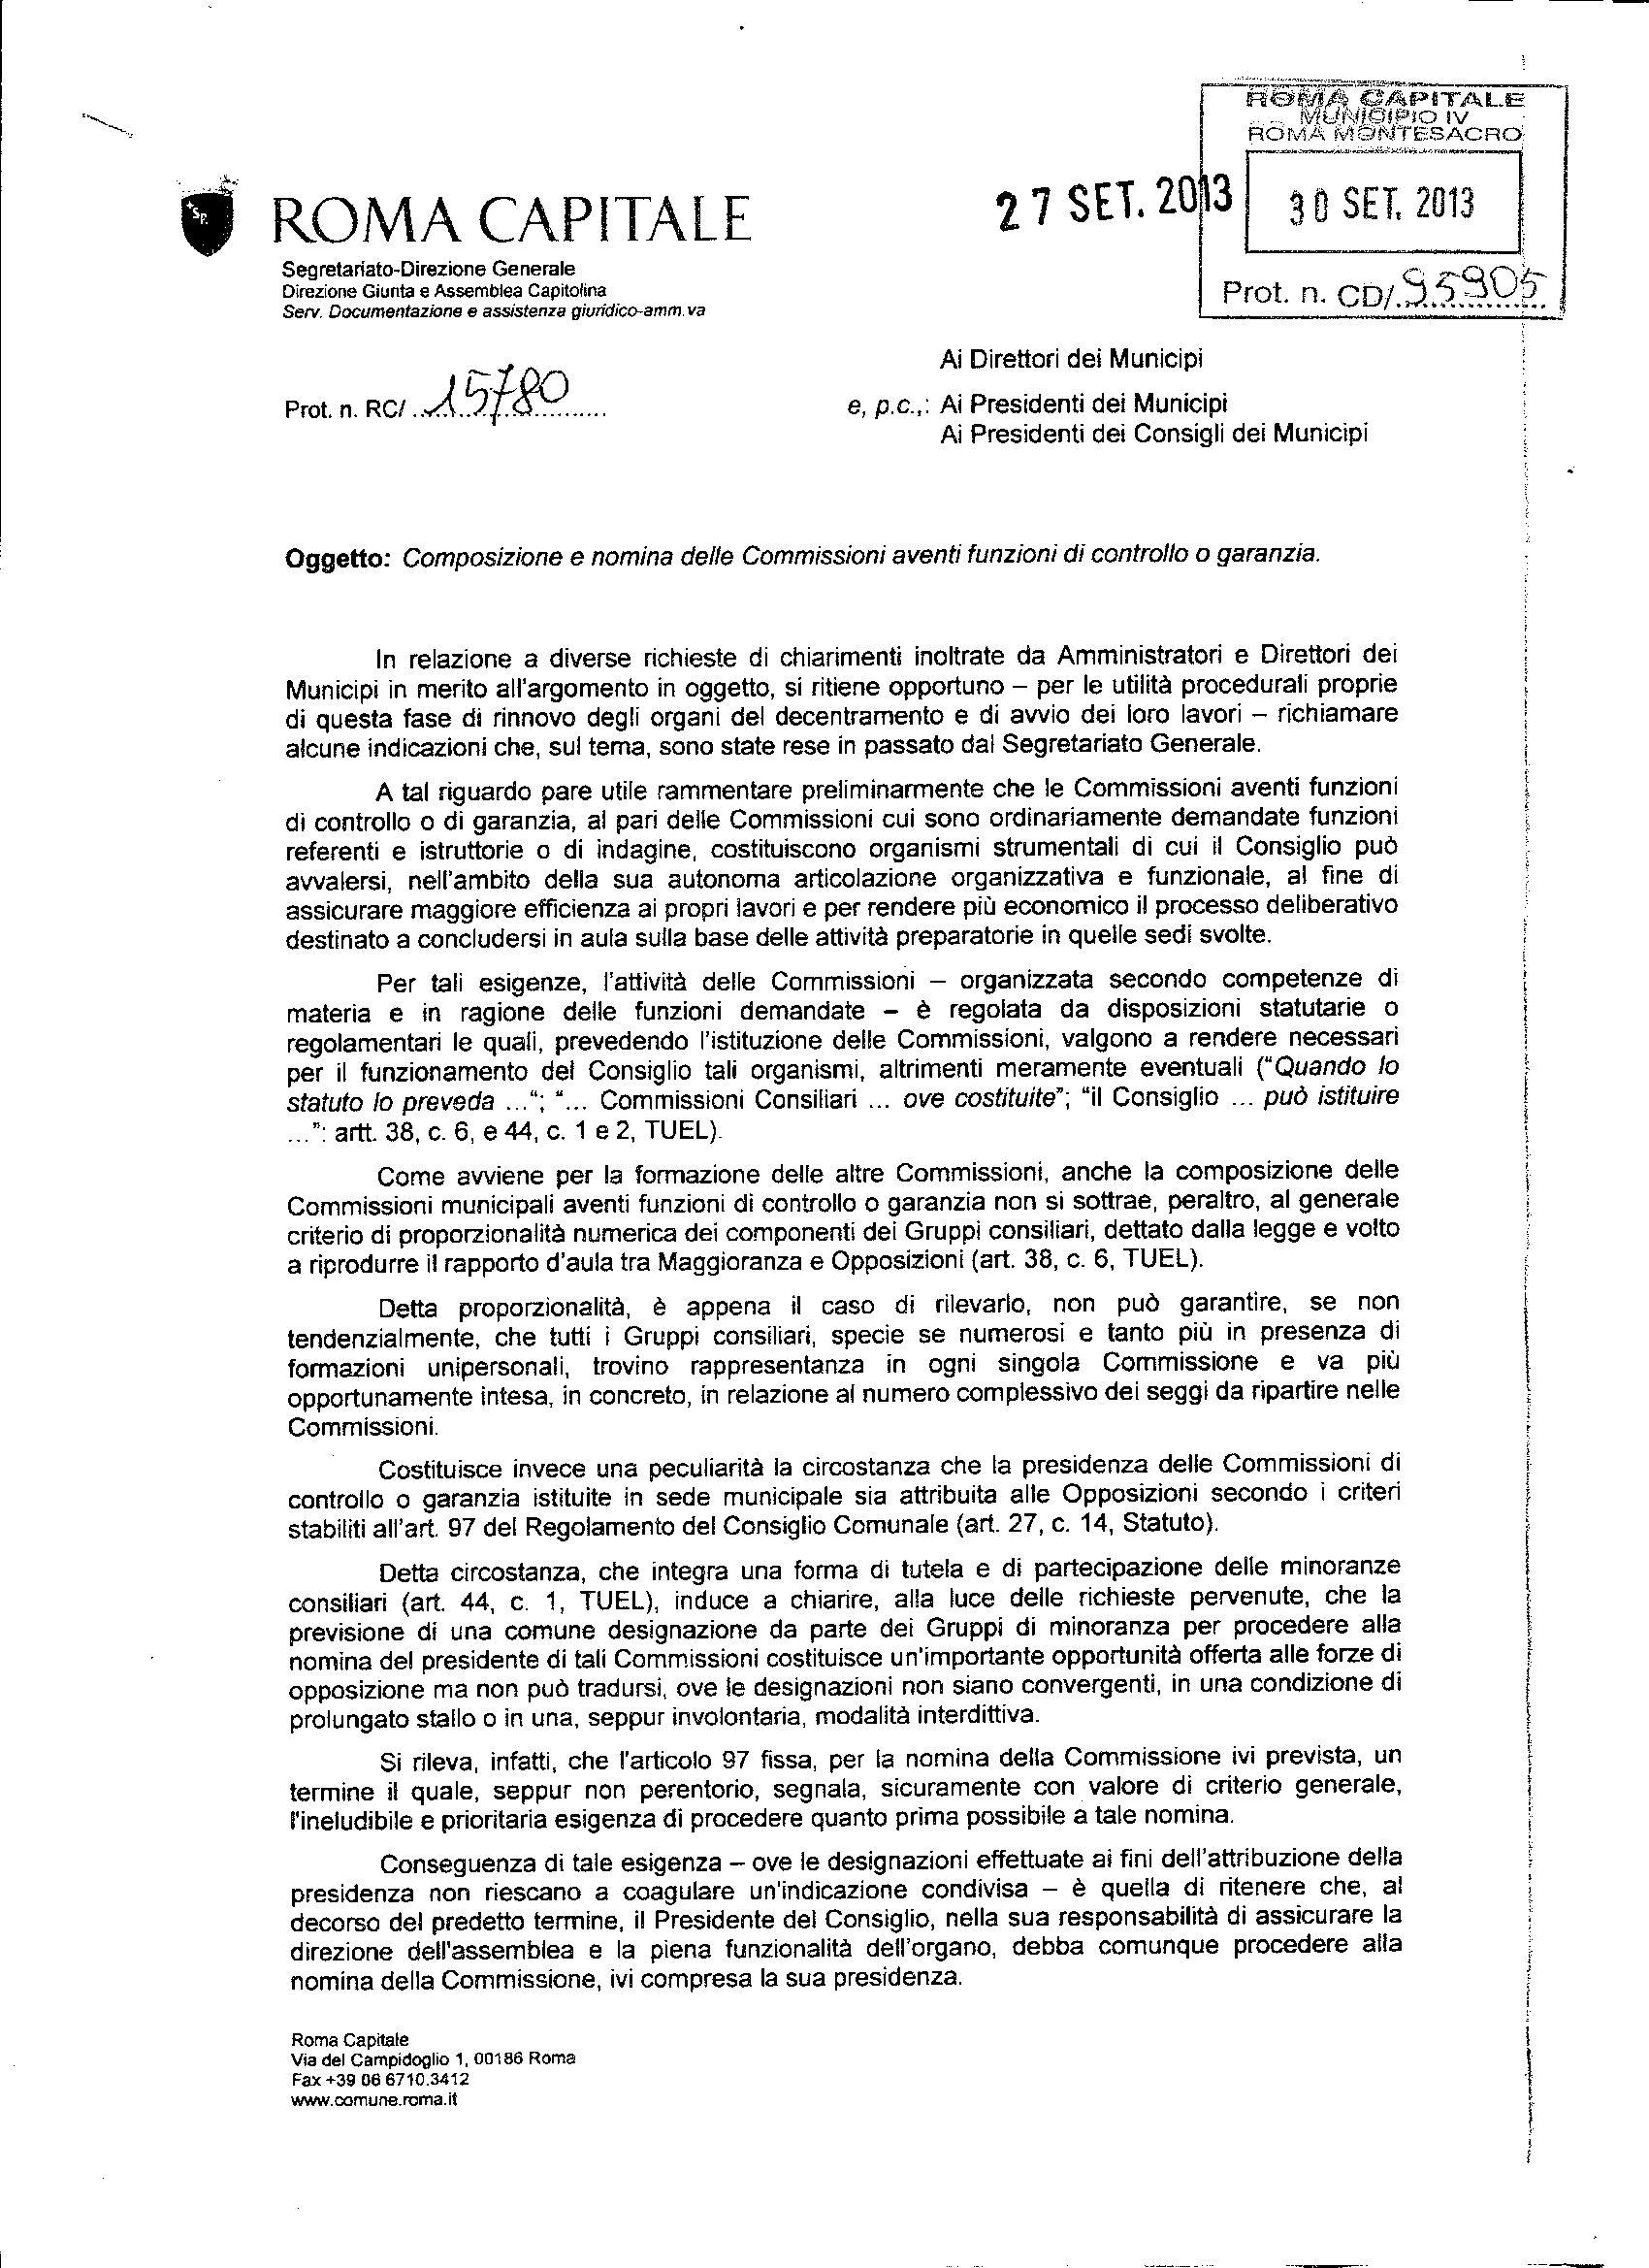 Trasparenza nota segretariato generale0001